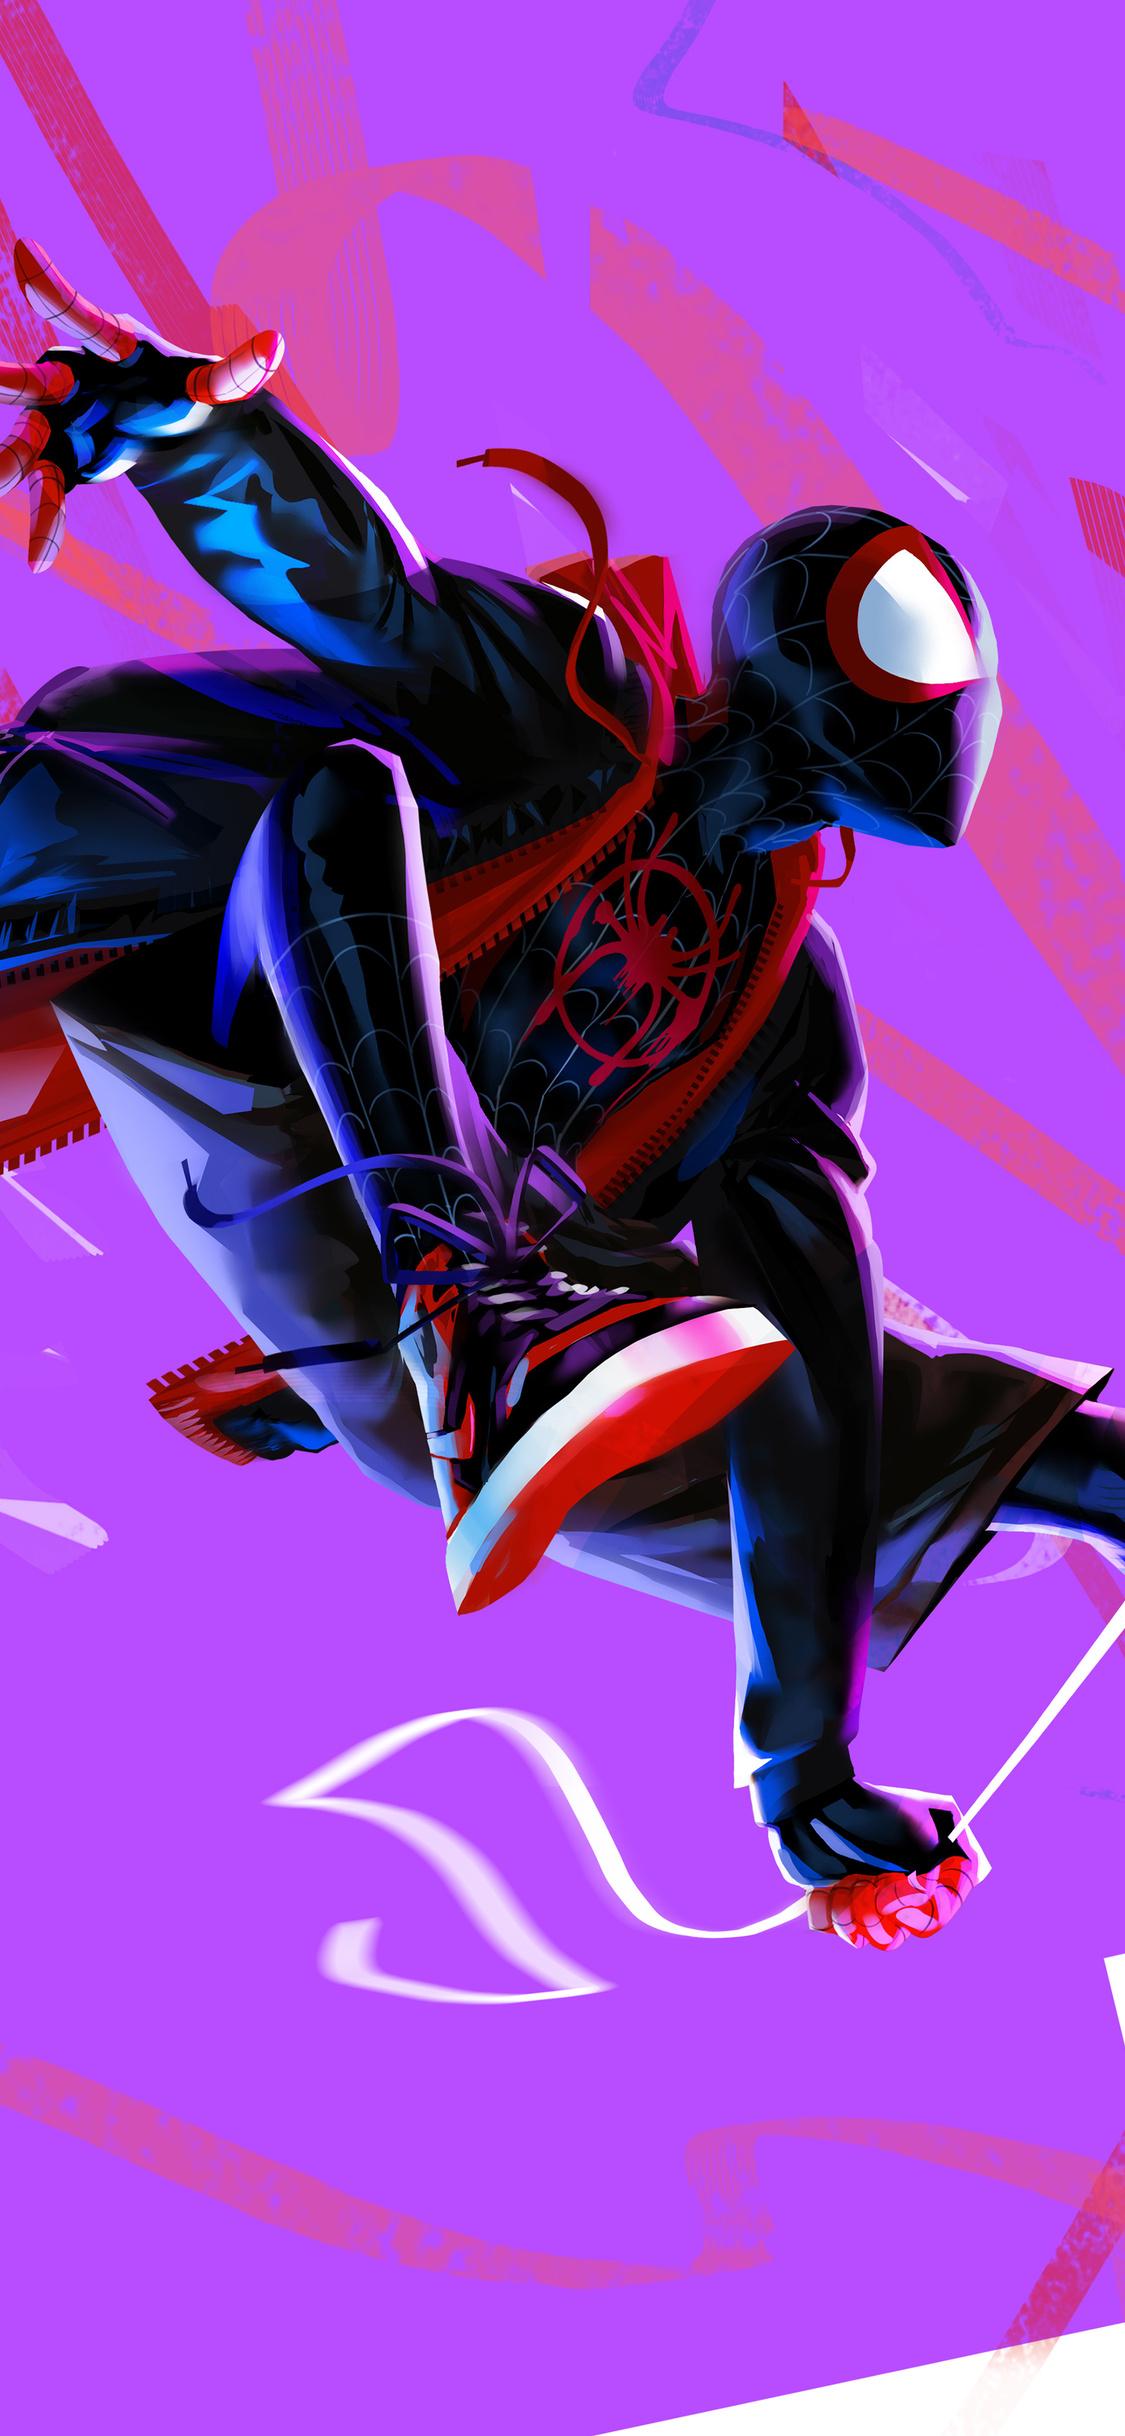 Spiderman Spider Verse Iphone X Wallpaper Wallpaper Iphone